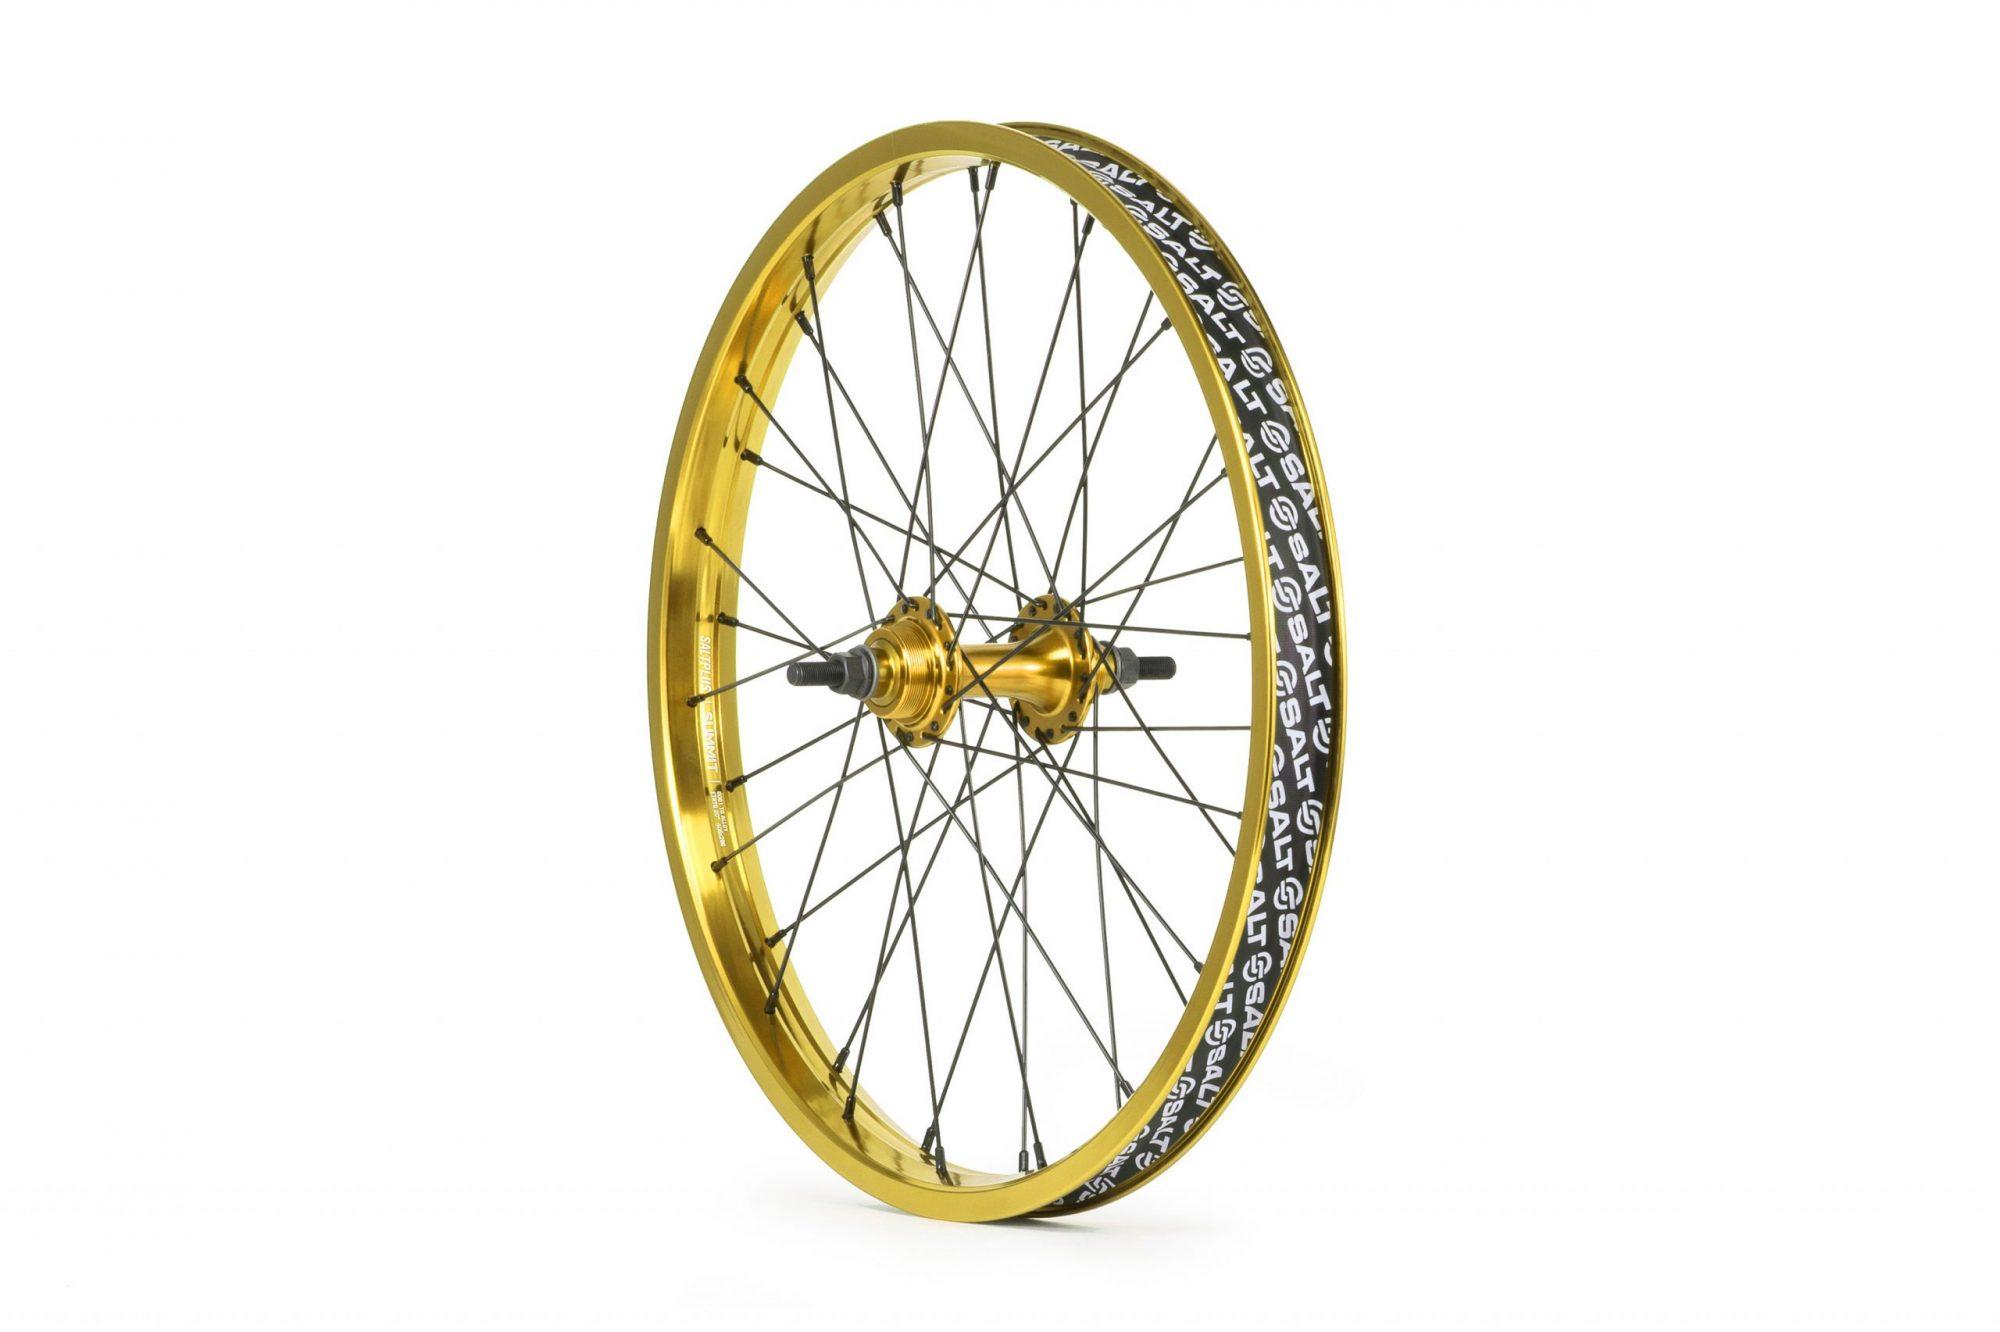 Salt_Everest_flipflop_rear_wheel_gold_02